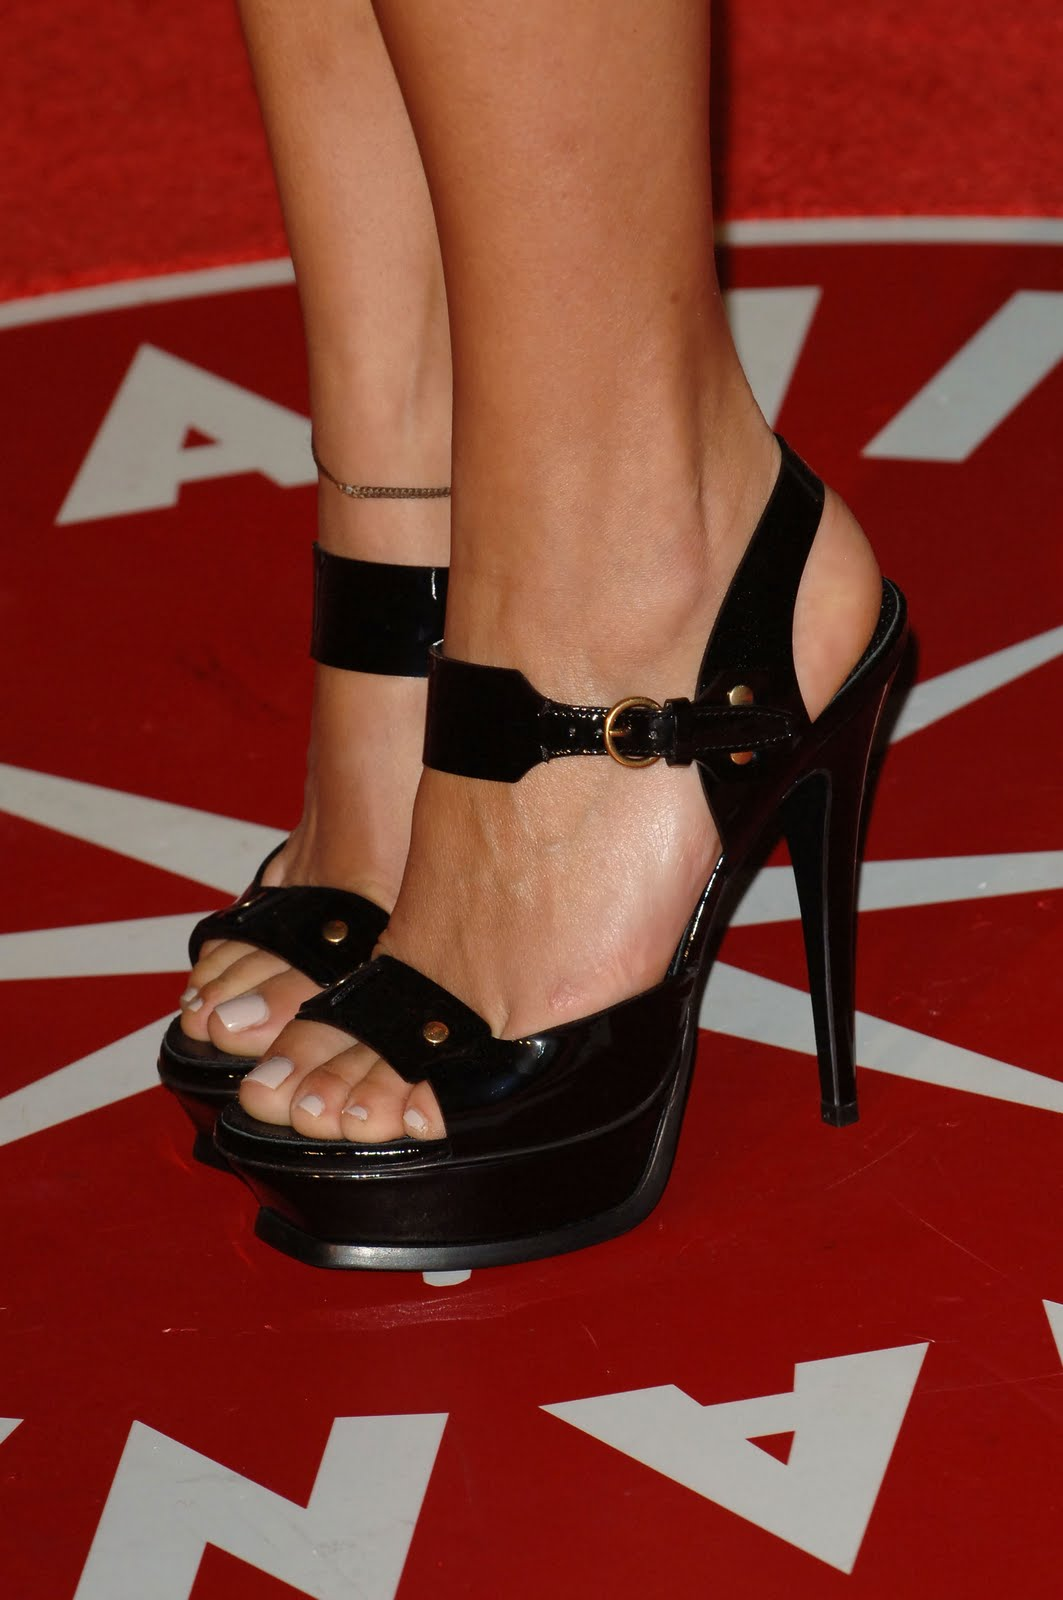 http://3.bp.blogspot.com/_UaLWp72nij4/TCuwhTNc-CI/AAAAAAAAQTE/Yf29lOHC0PQ/s1600/rashida-jones-feet-4.jpg